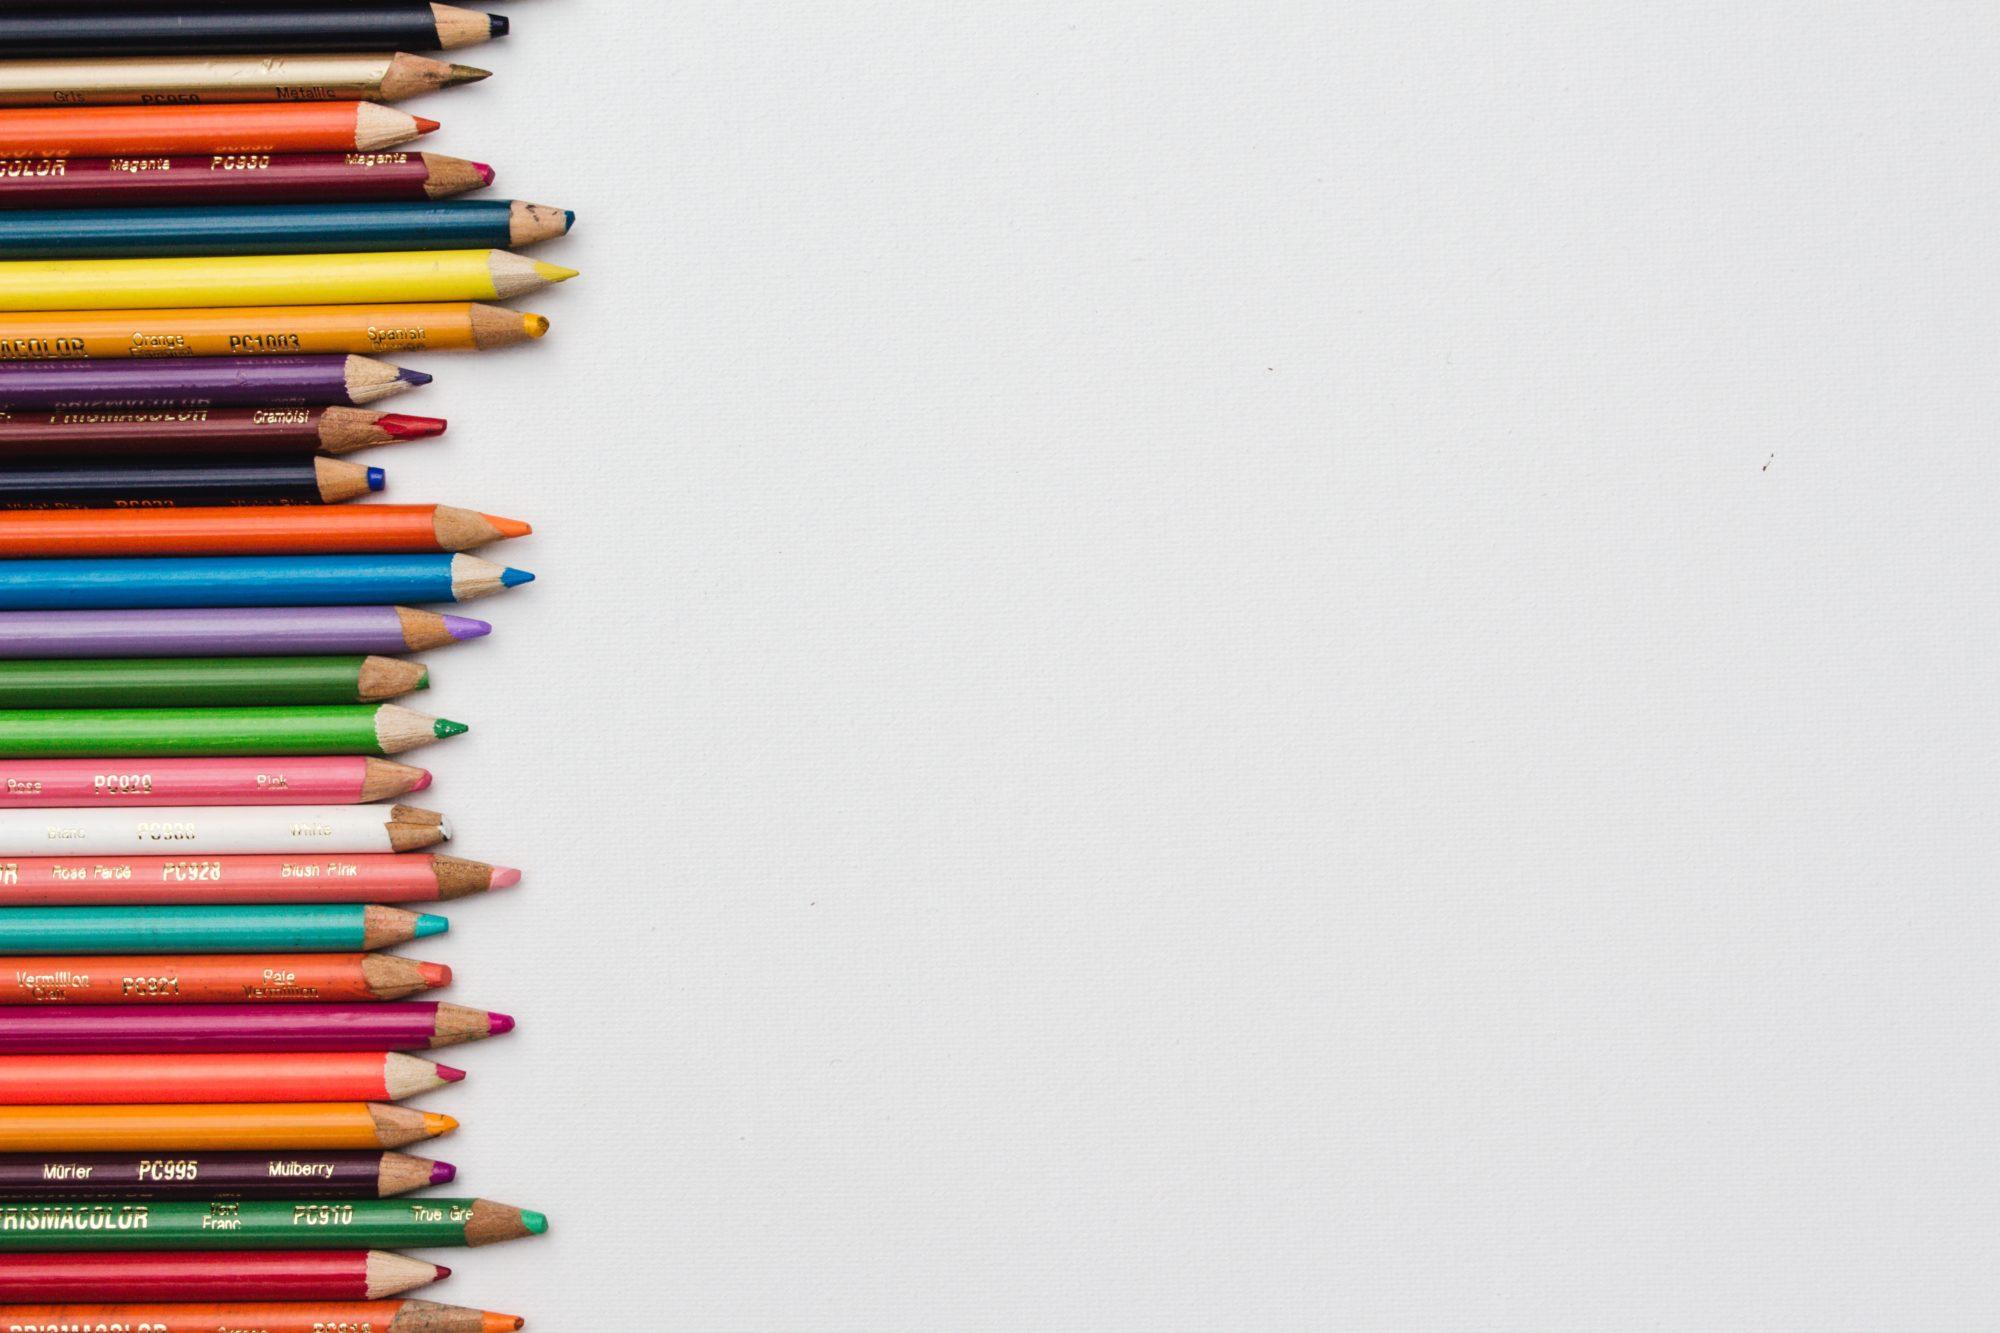 Revolutionising Childhood Education: Logan LaPlante